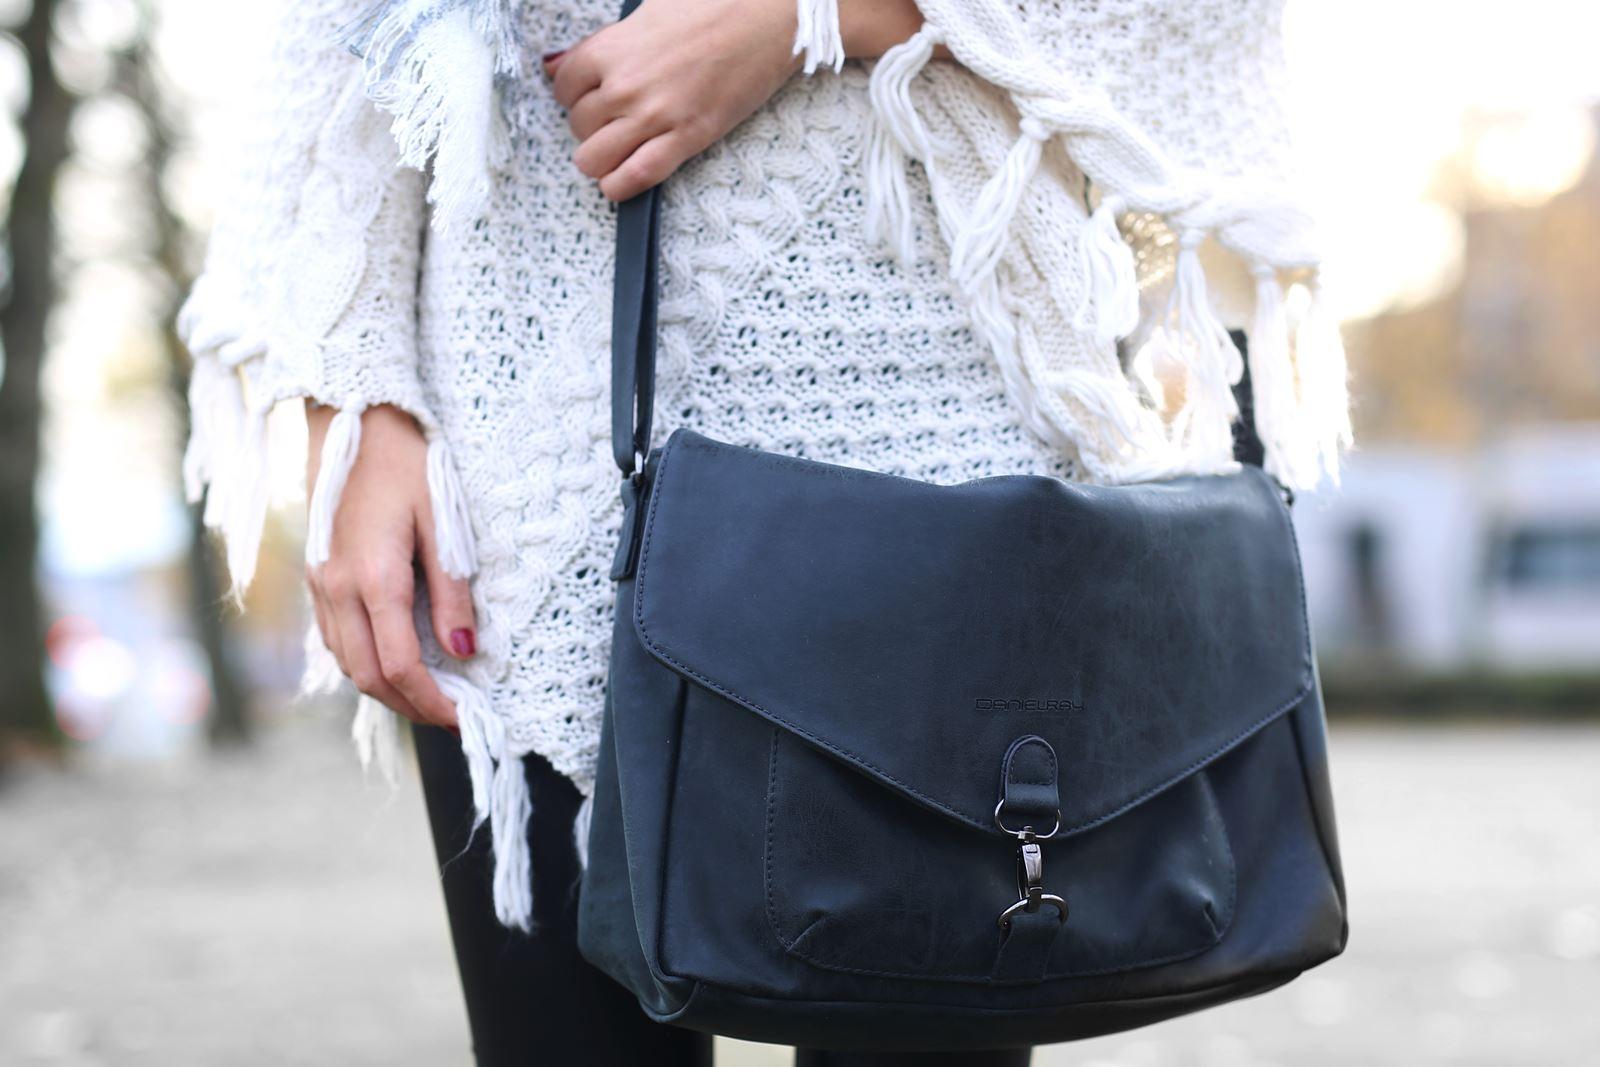 modeblog-german-fashion-blog-herbst-outfit-poncho-xxl-schal-9